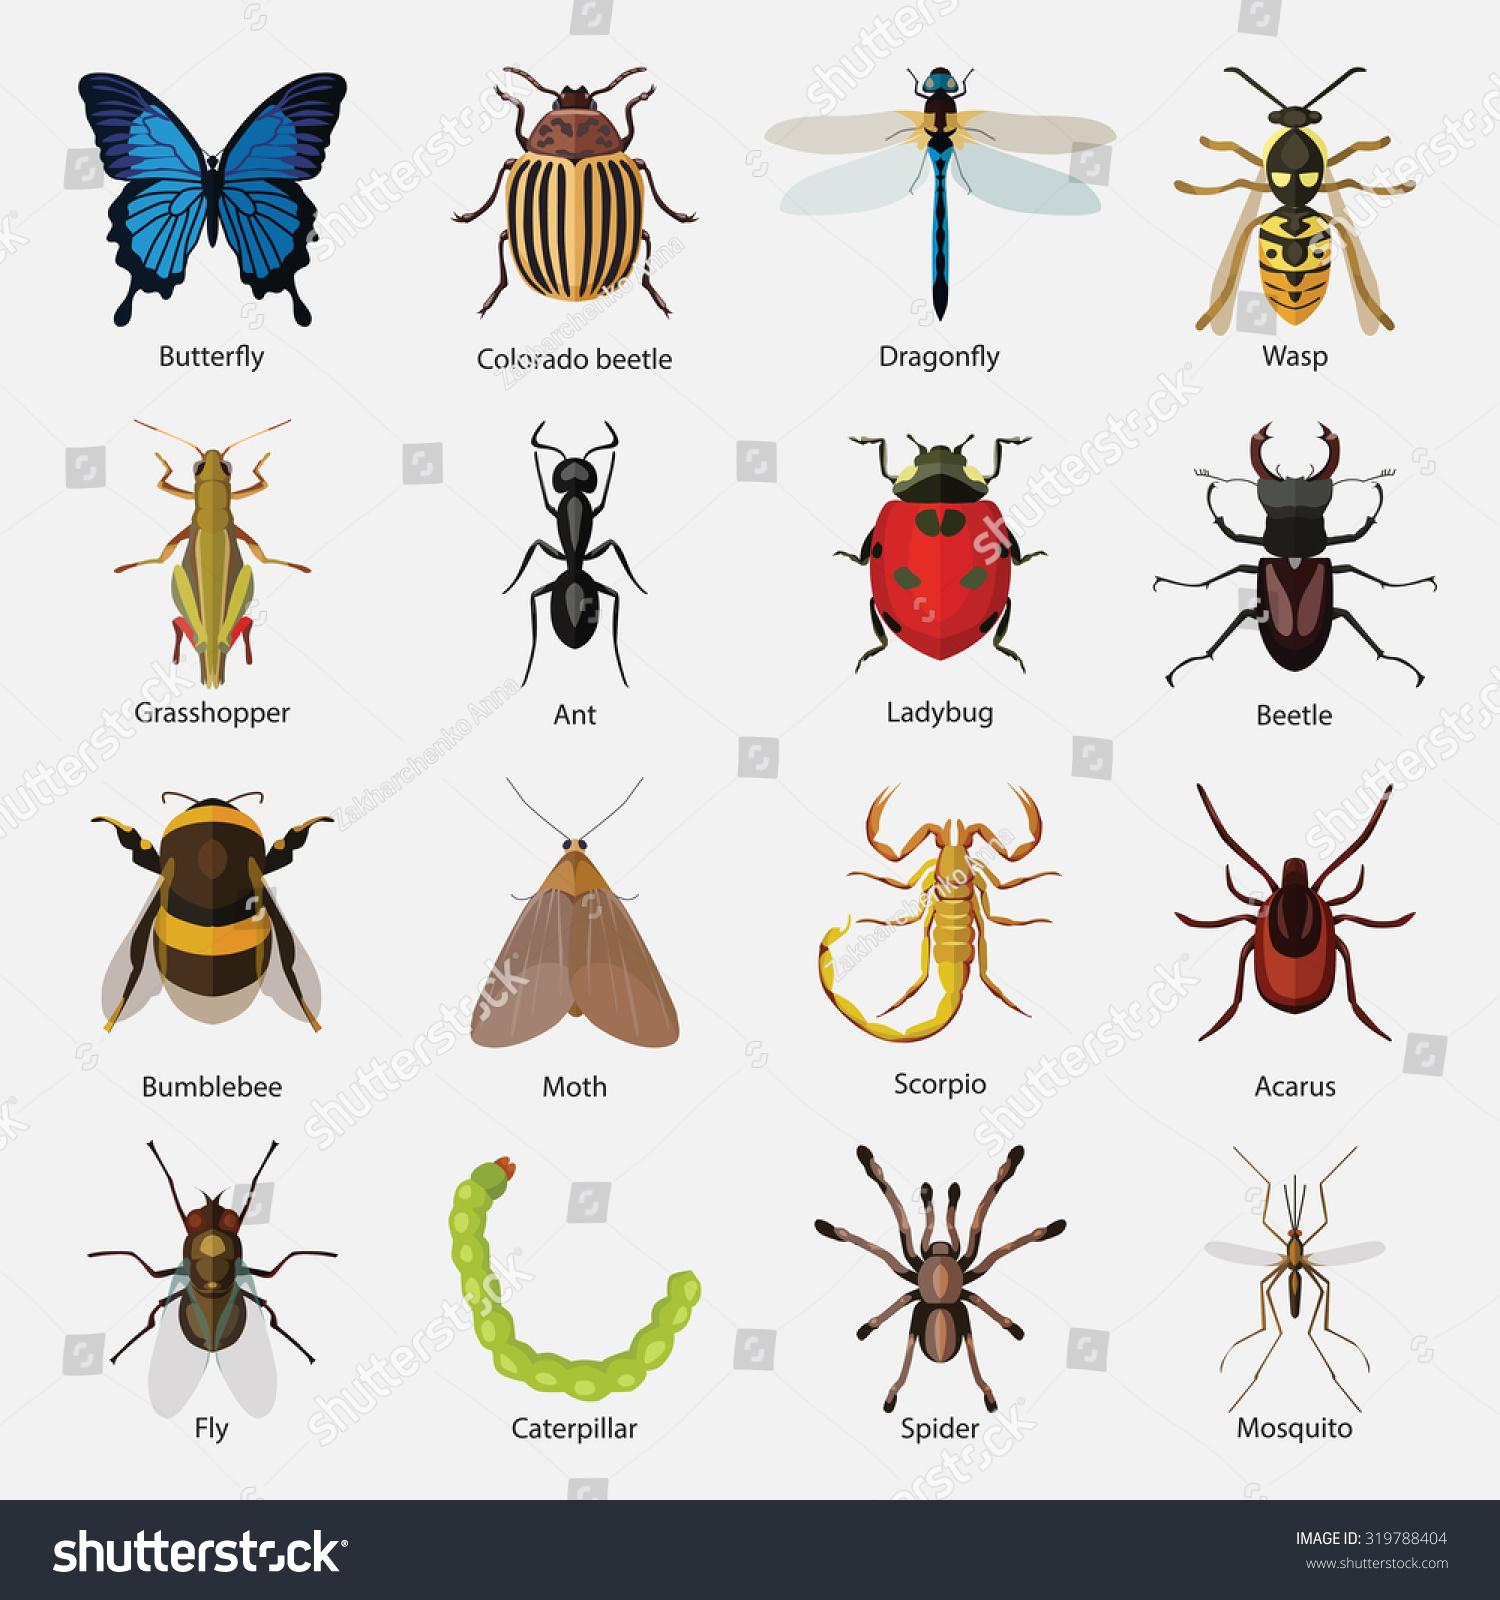 how to create a ascending list grasshopper